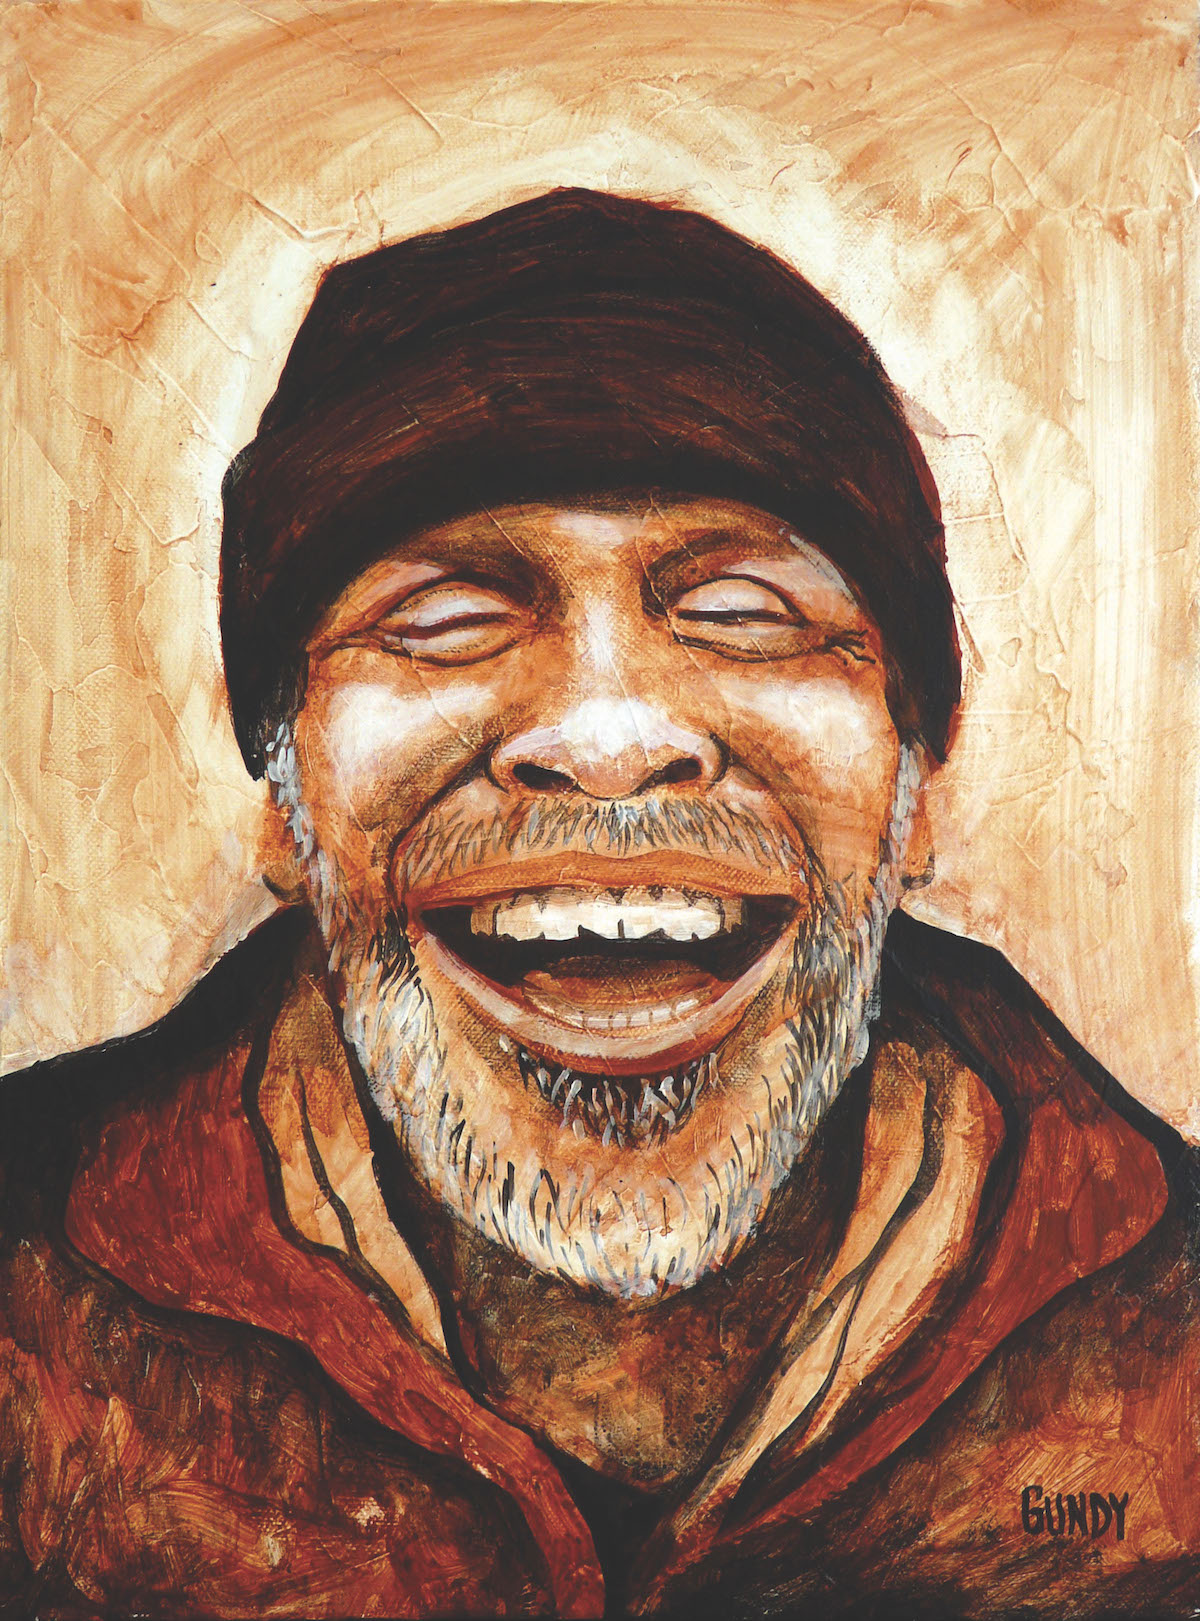 portrait of Addis Michael Jr from Real Change exhibit